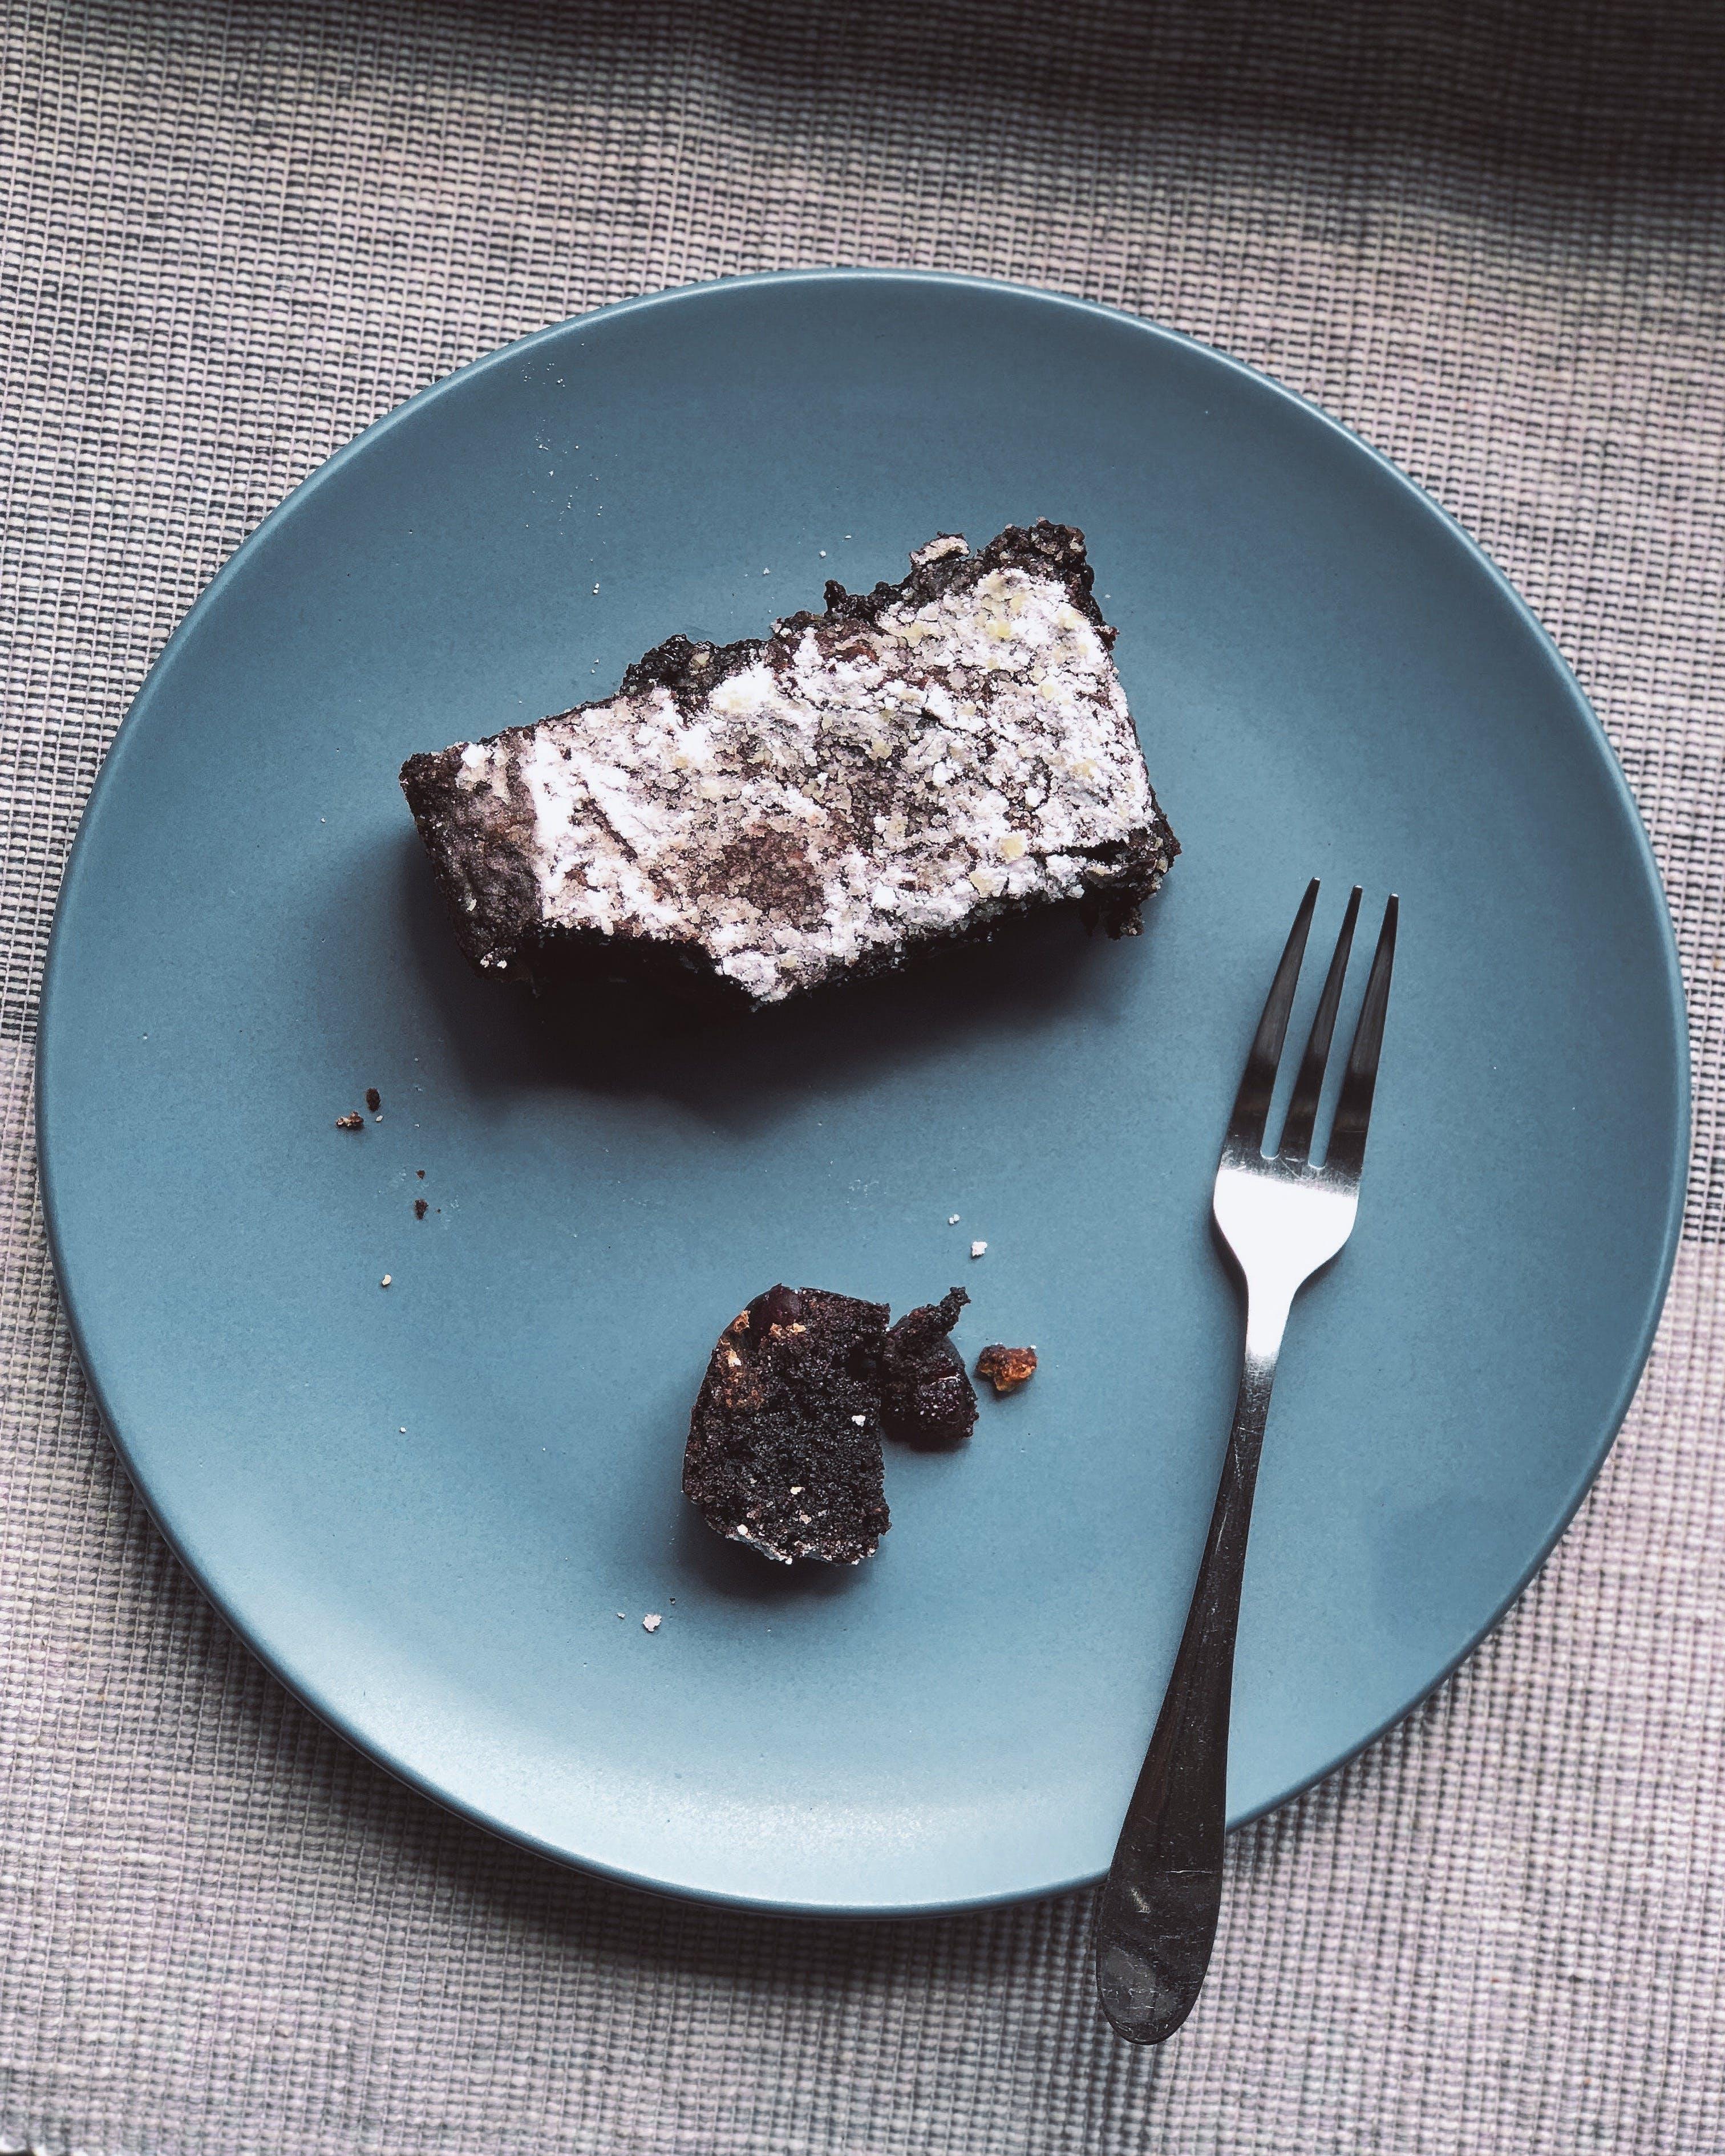 Gratis lagerfoto af bestik, chokolade, delikat, forgrening